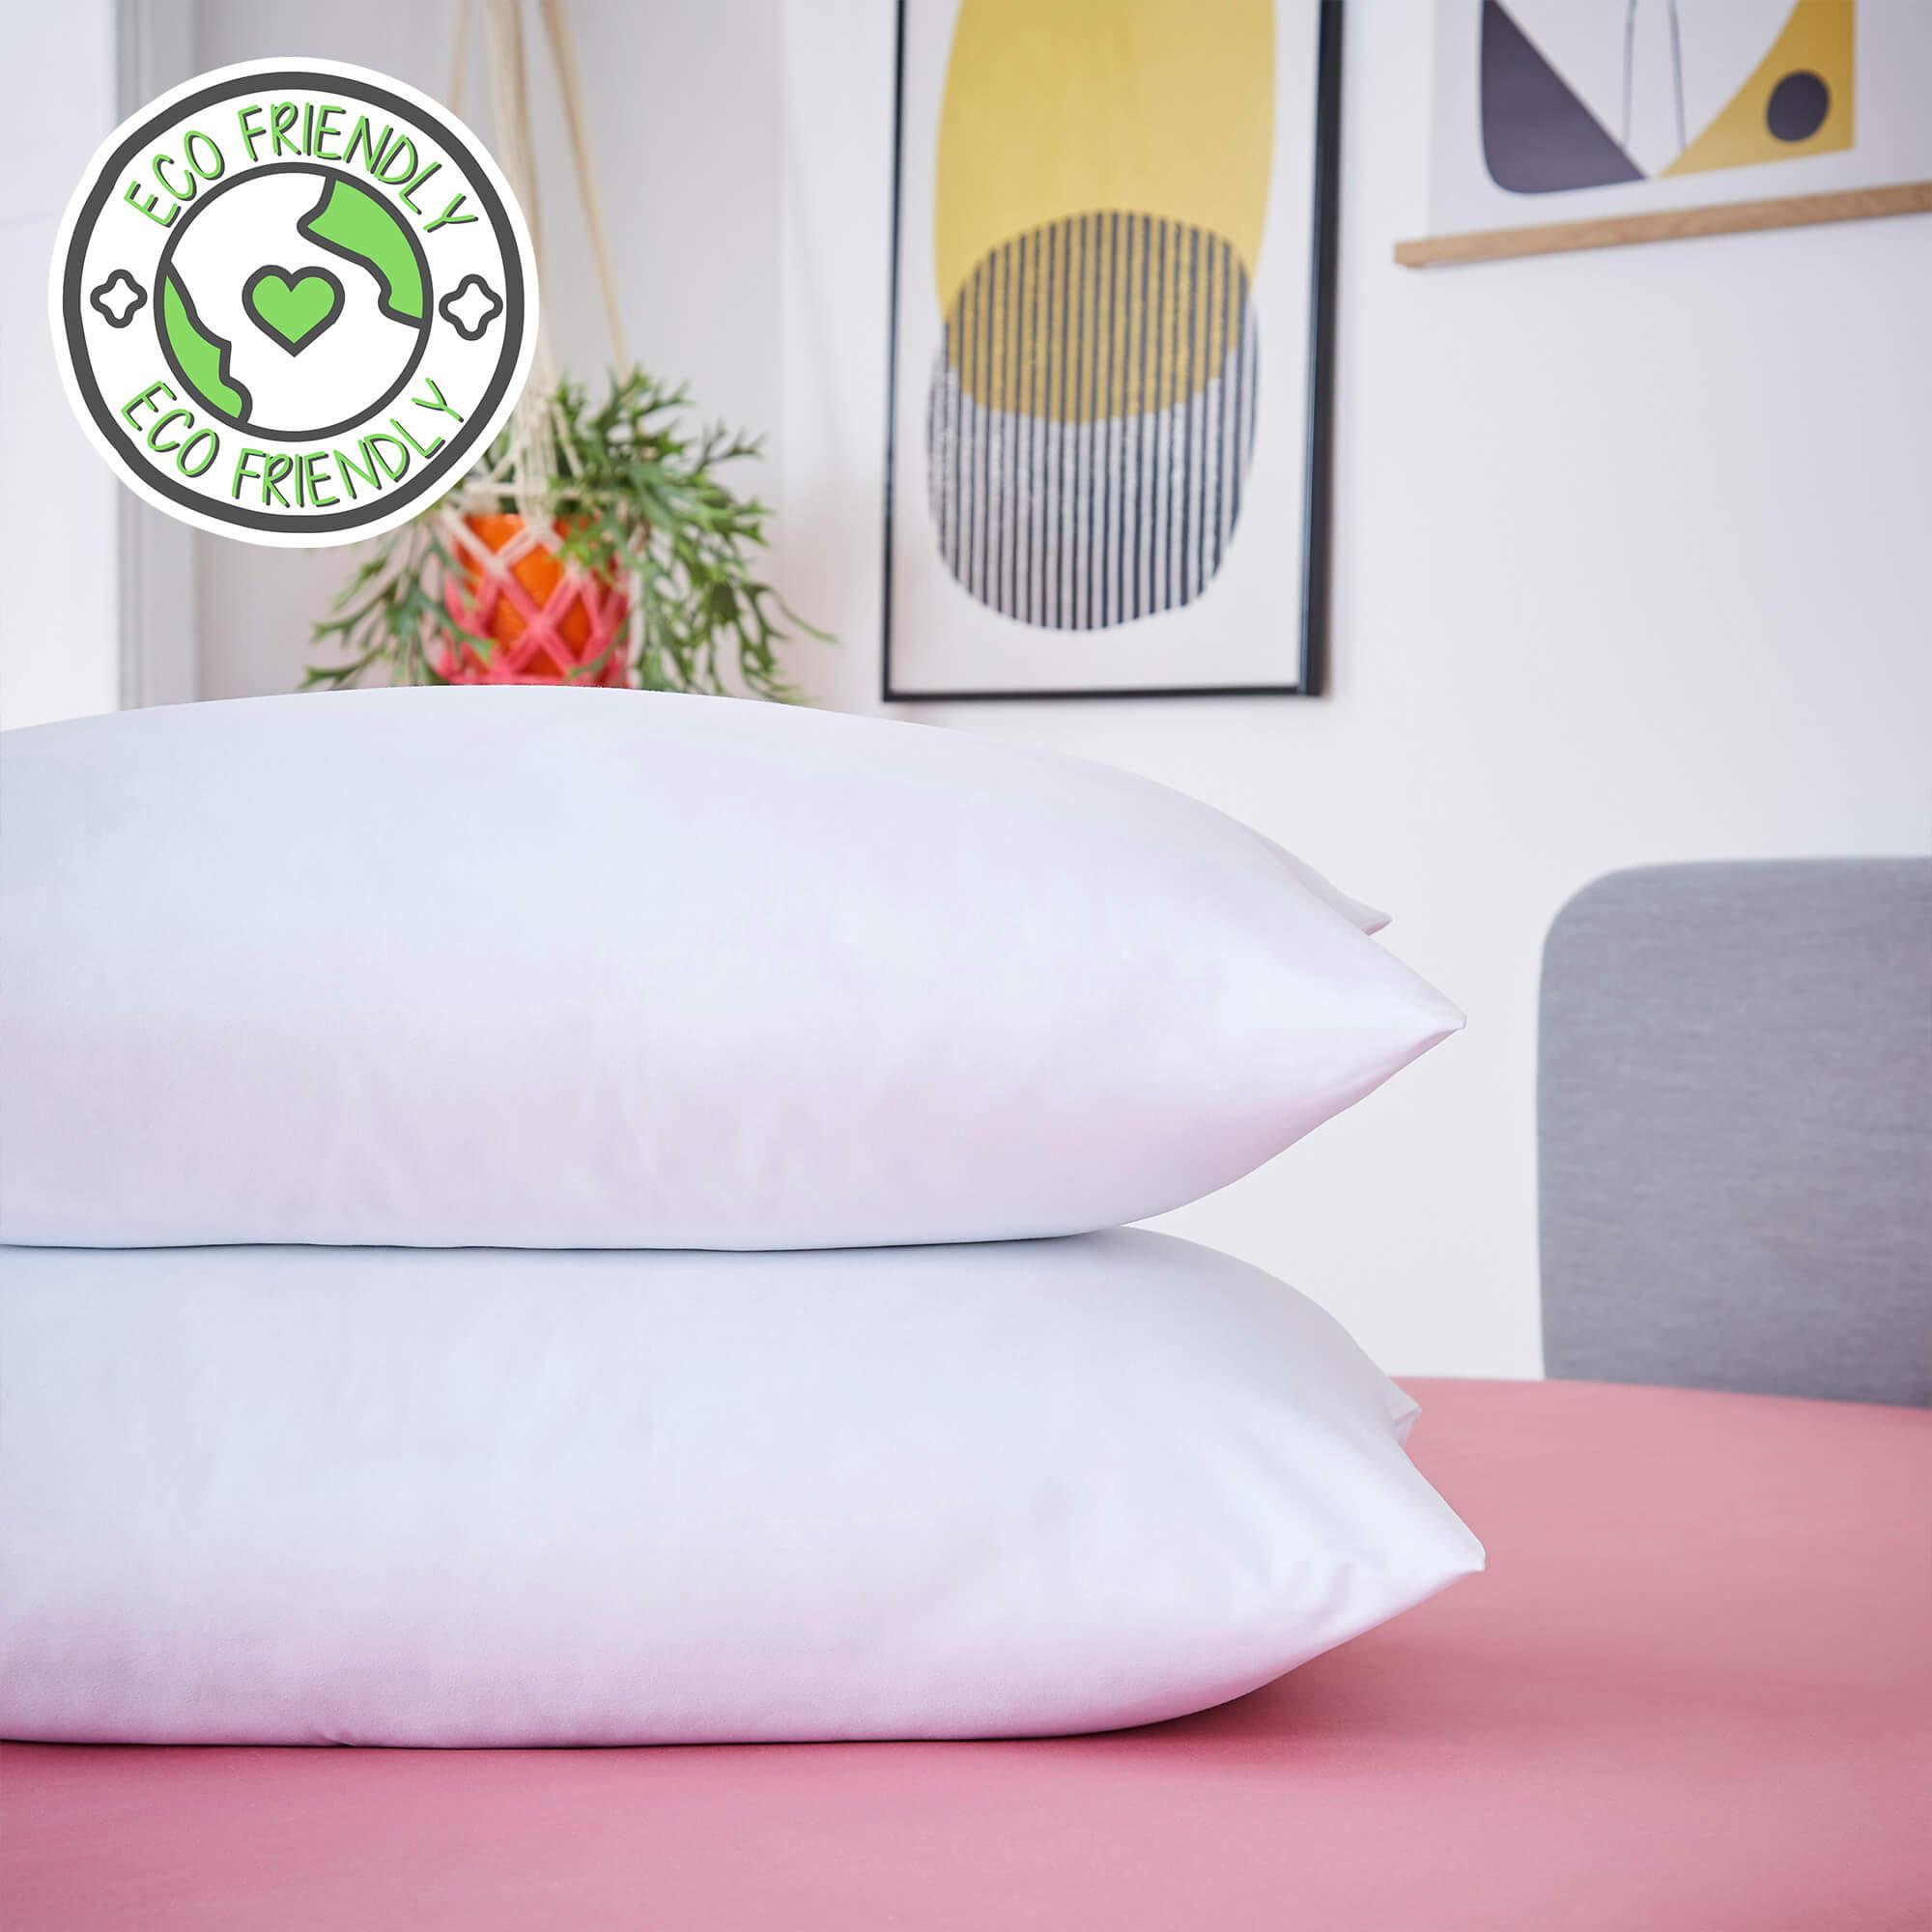 Snug Fantastically Firm Pillows